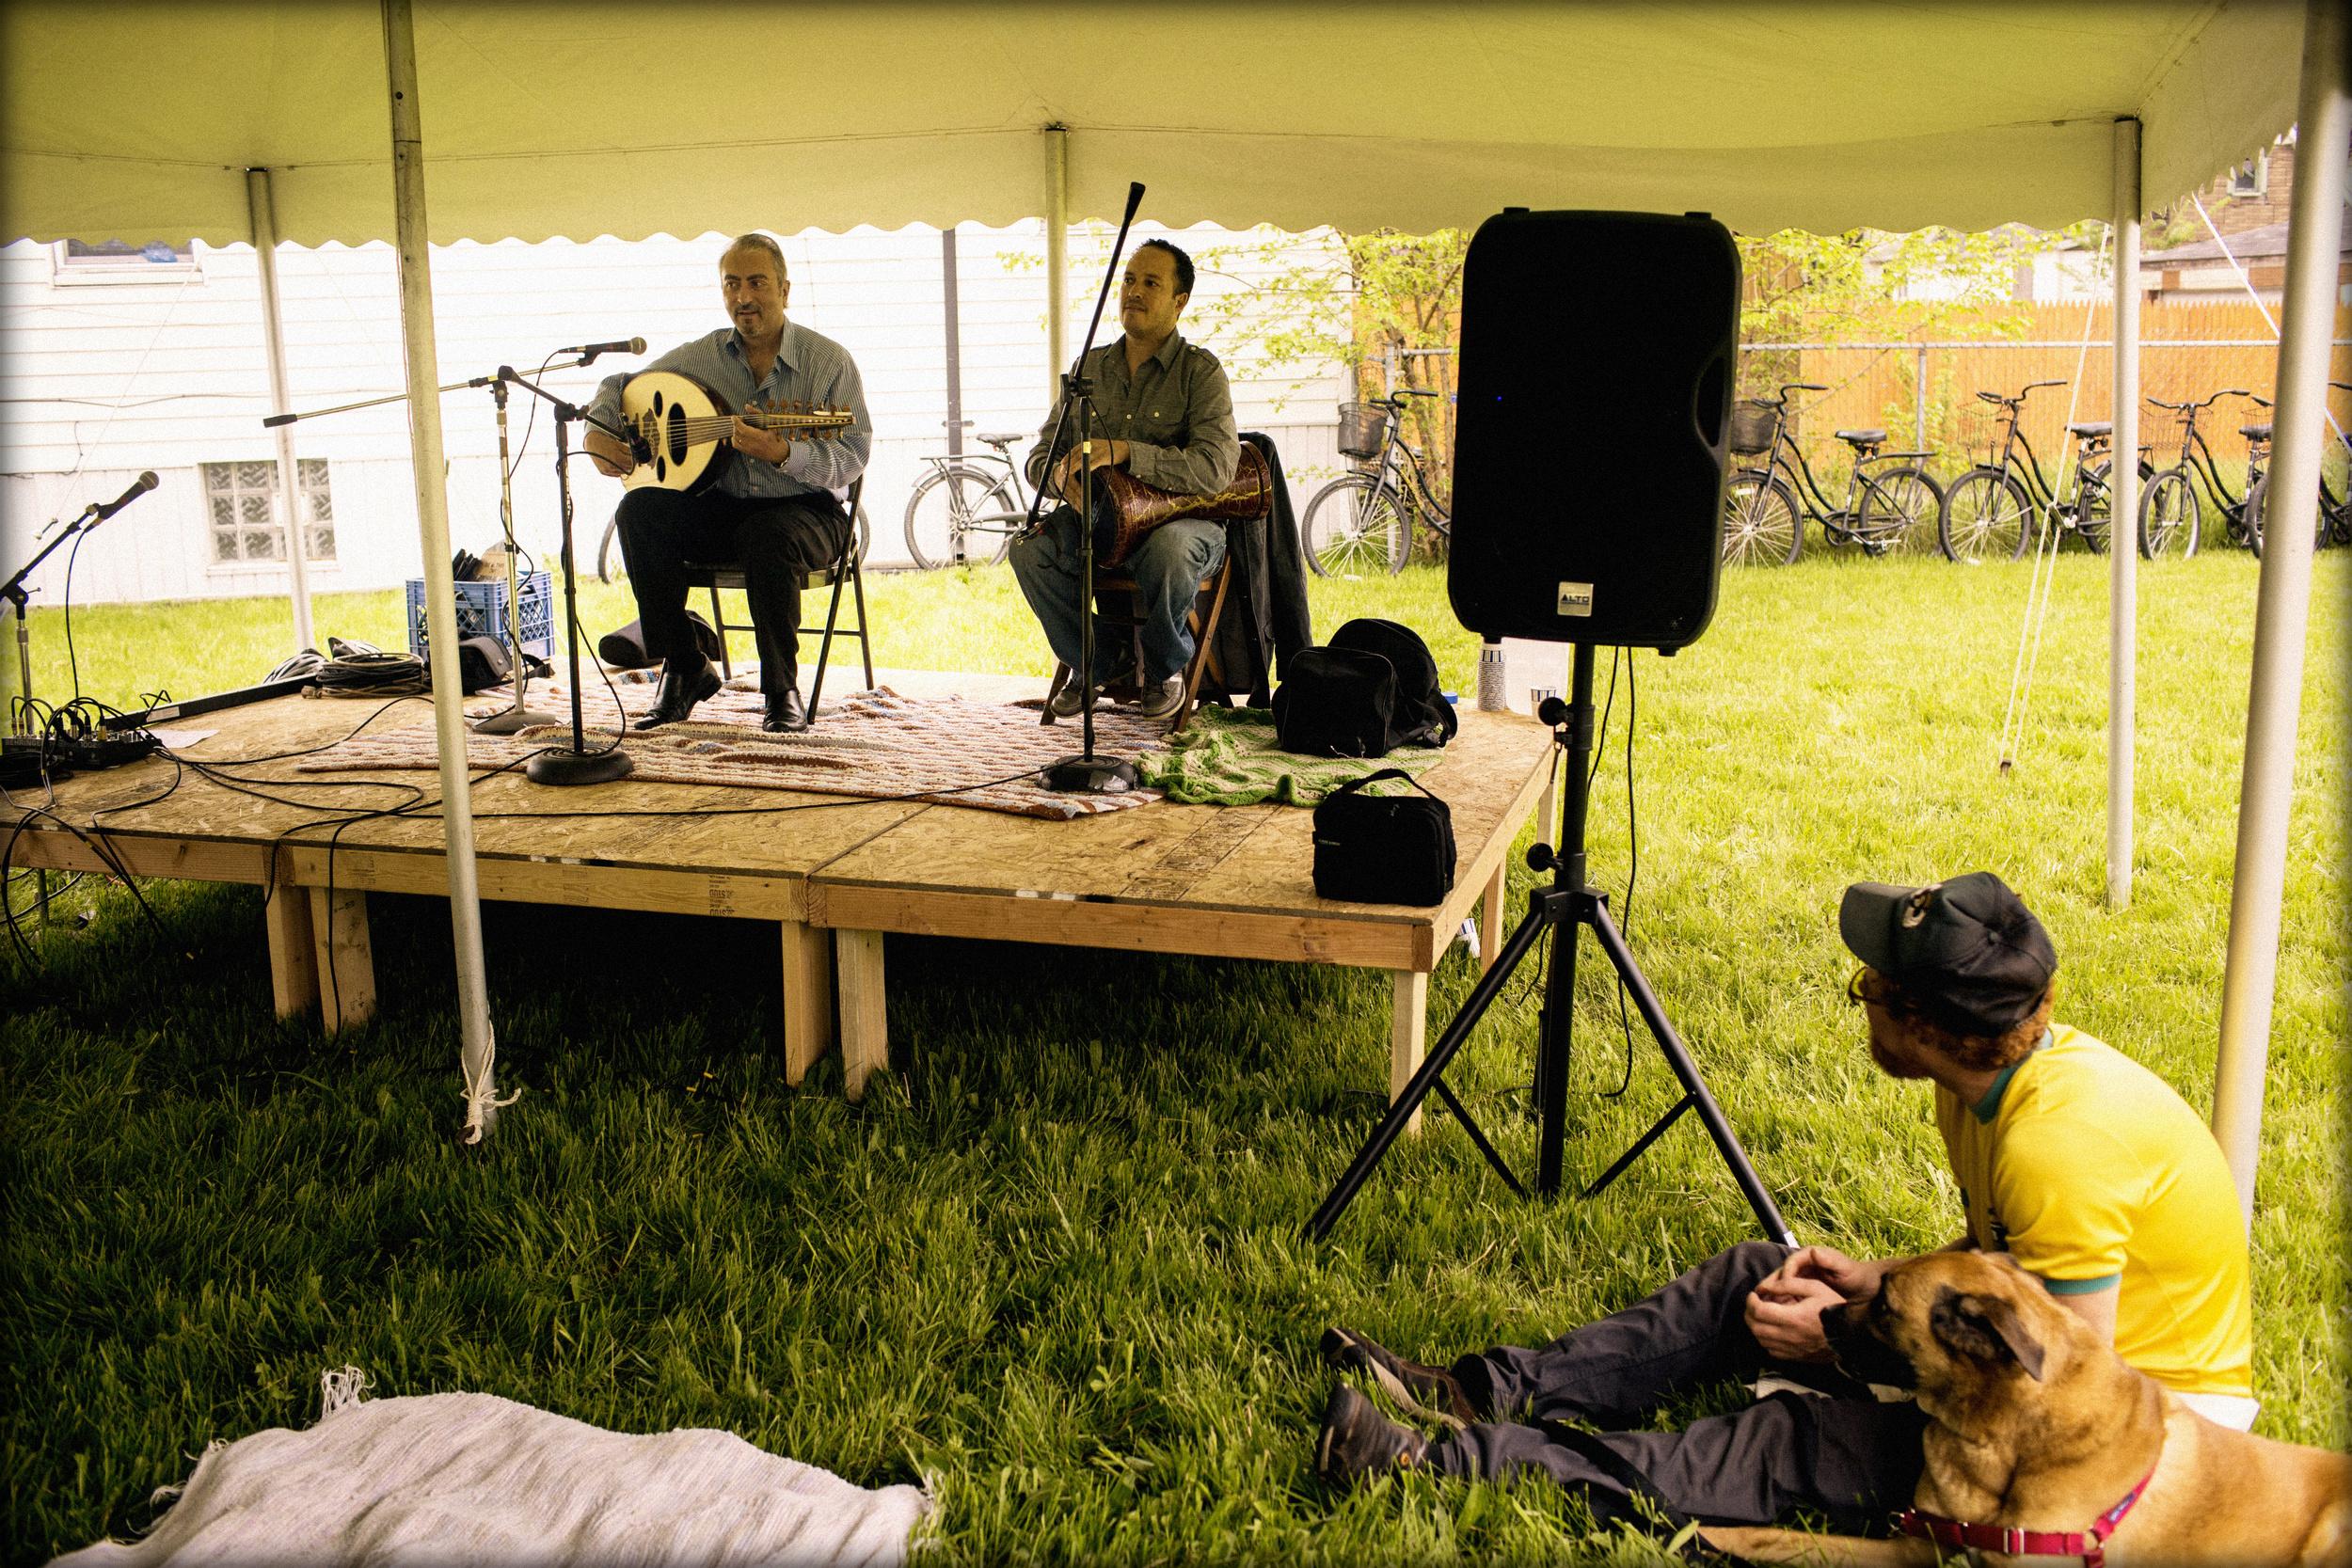 Victor Ghannam &Ons Boukraa - Detroit Folk Workshop Stage - Porous Borders Festival - May 2015 - Hamtramck, MI